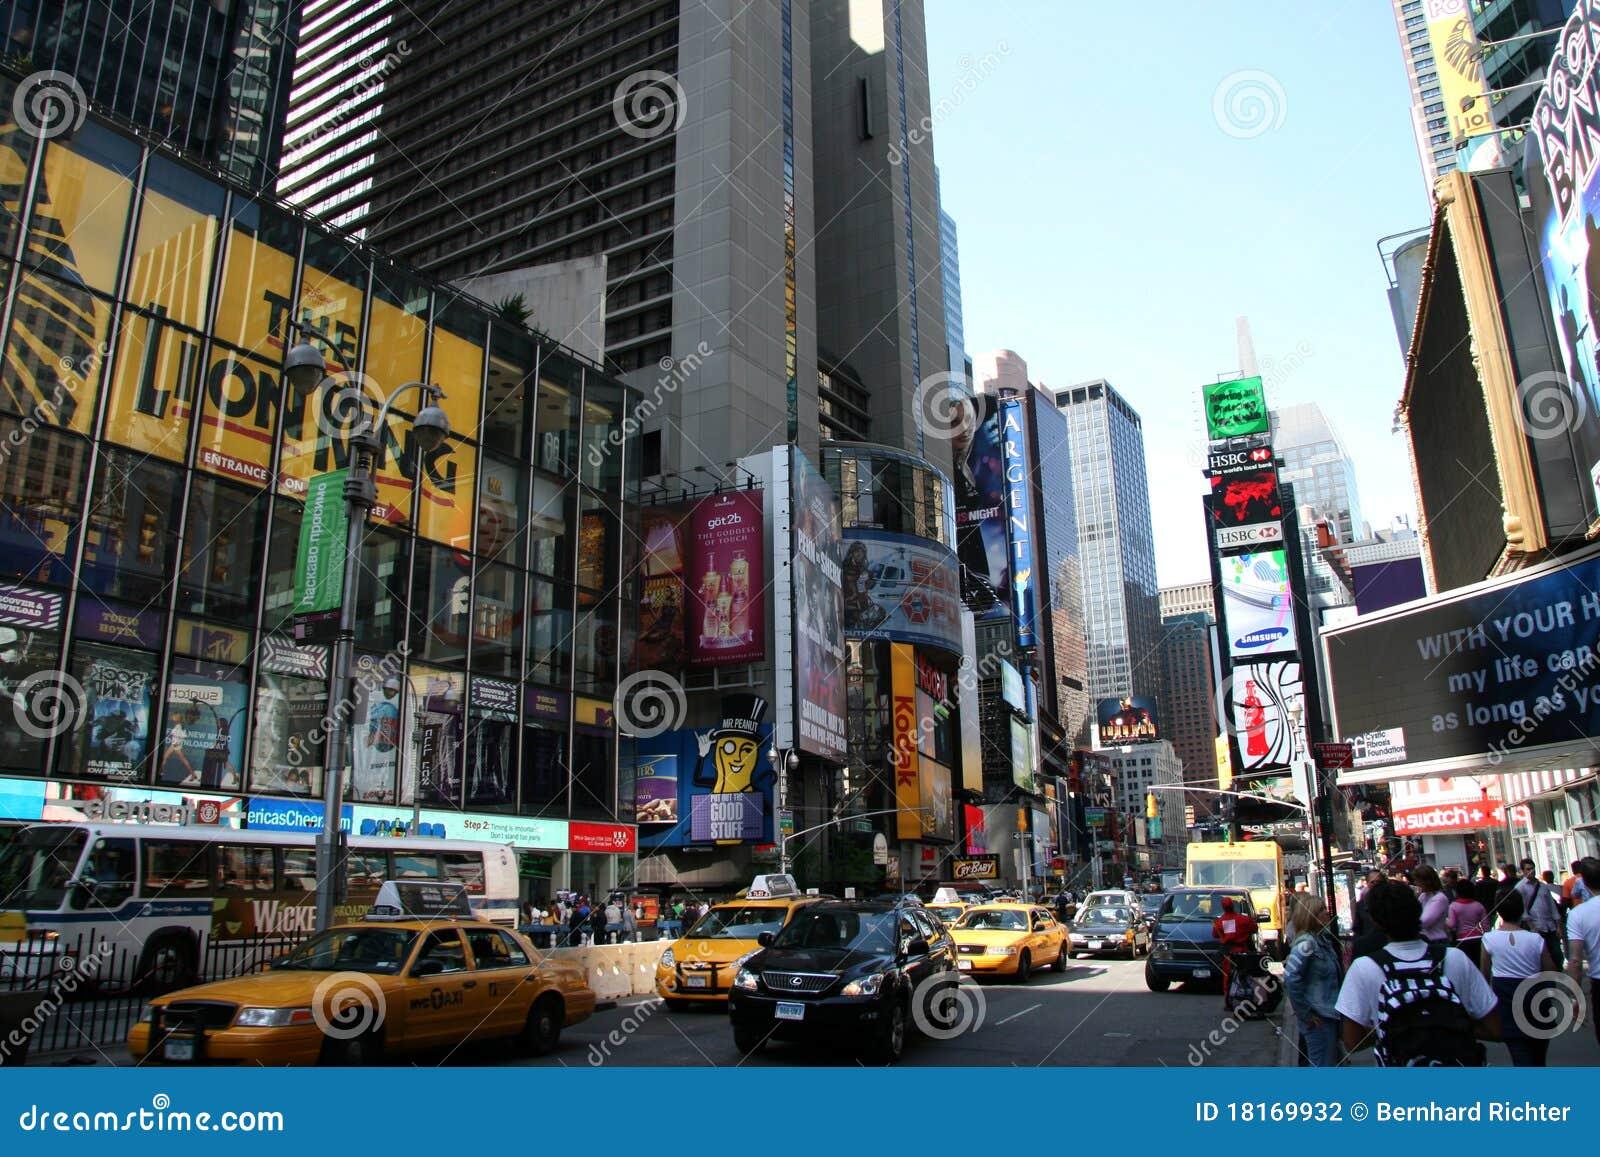 Fashion Avenue New York Shopping